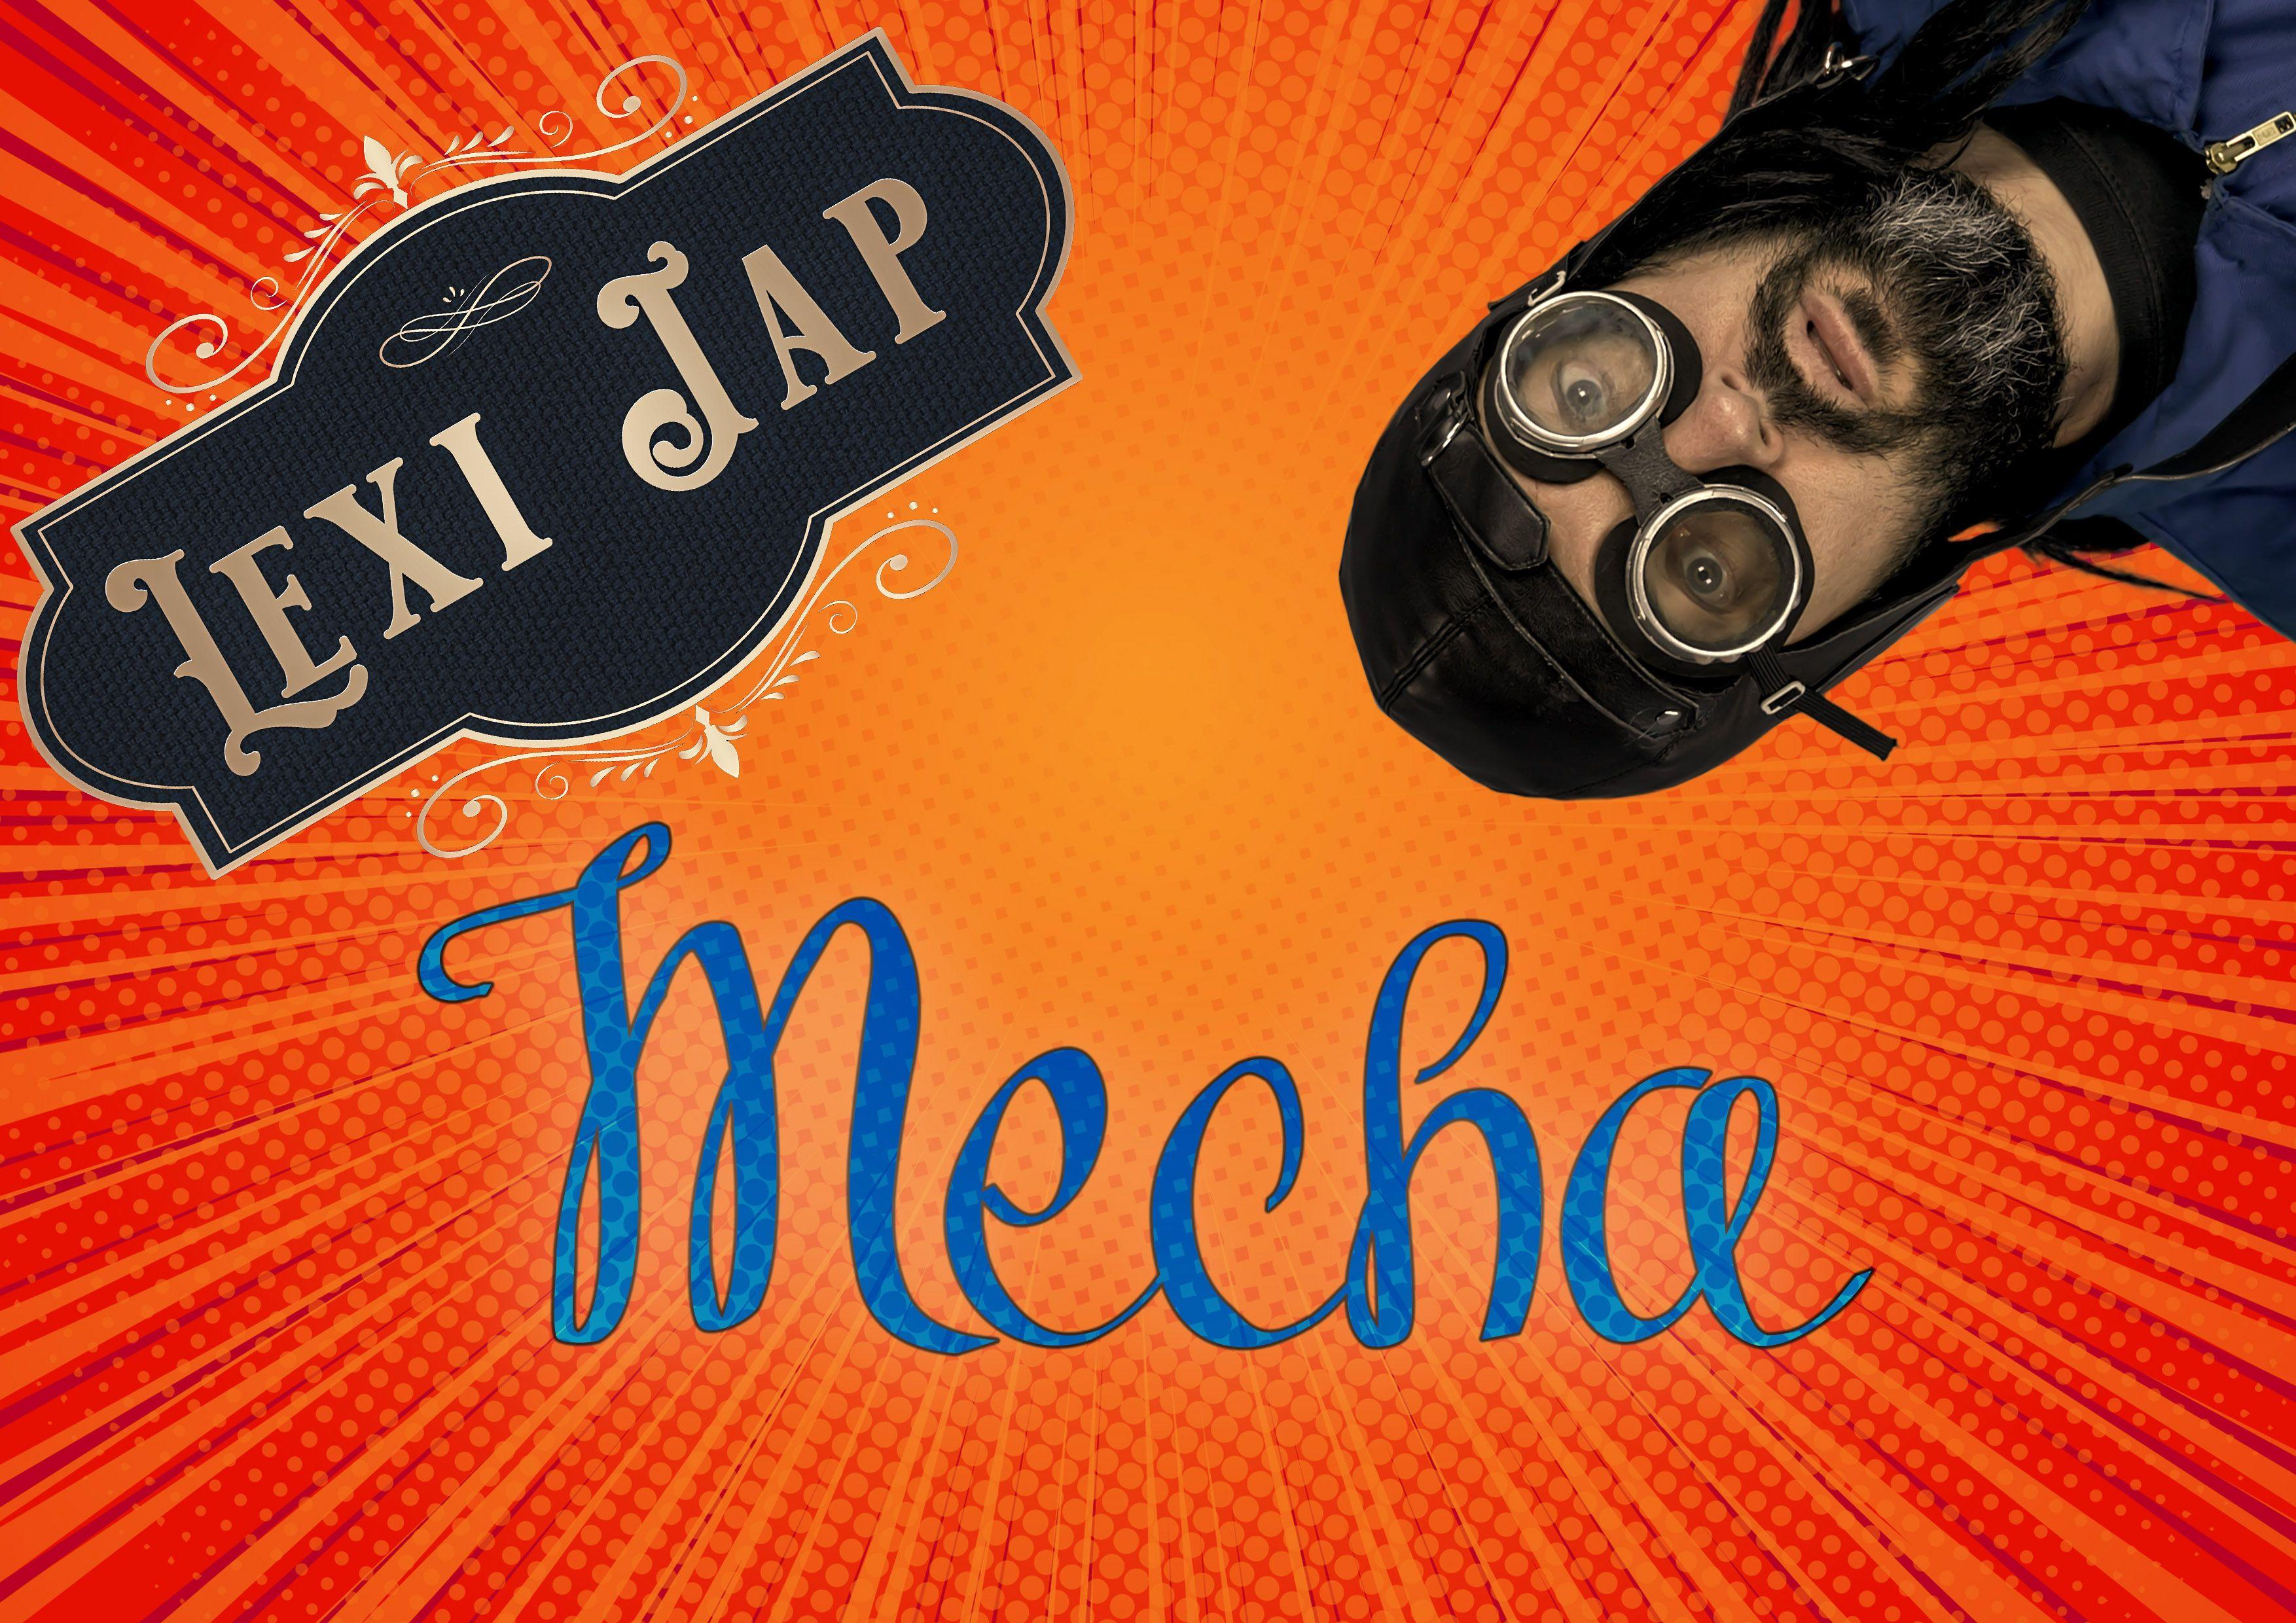 LexiJap-Mecha.jpg